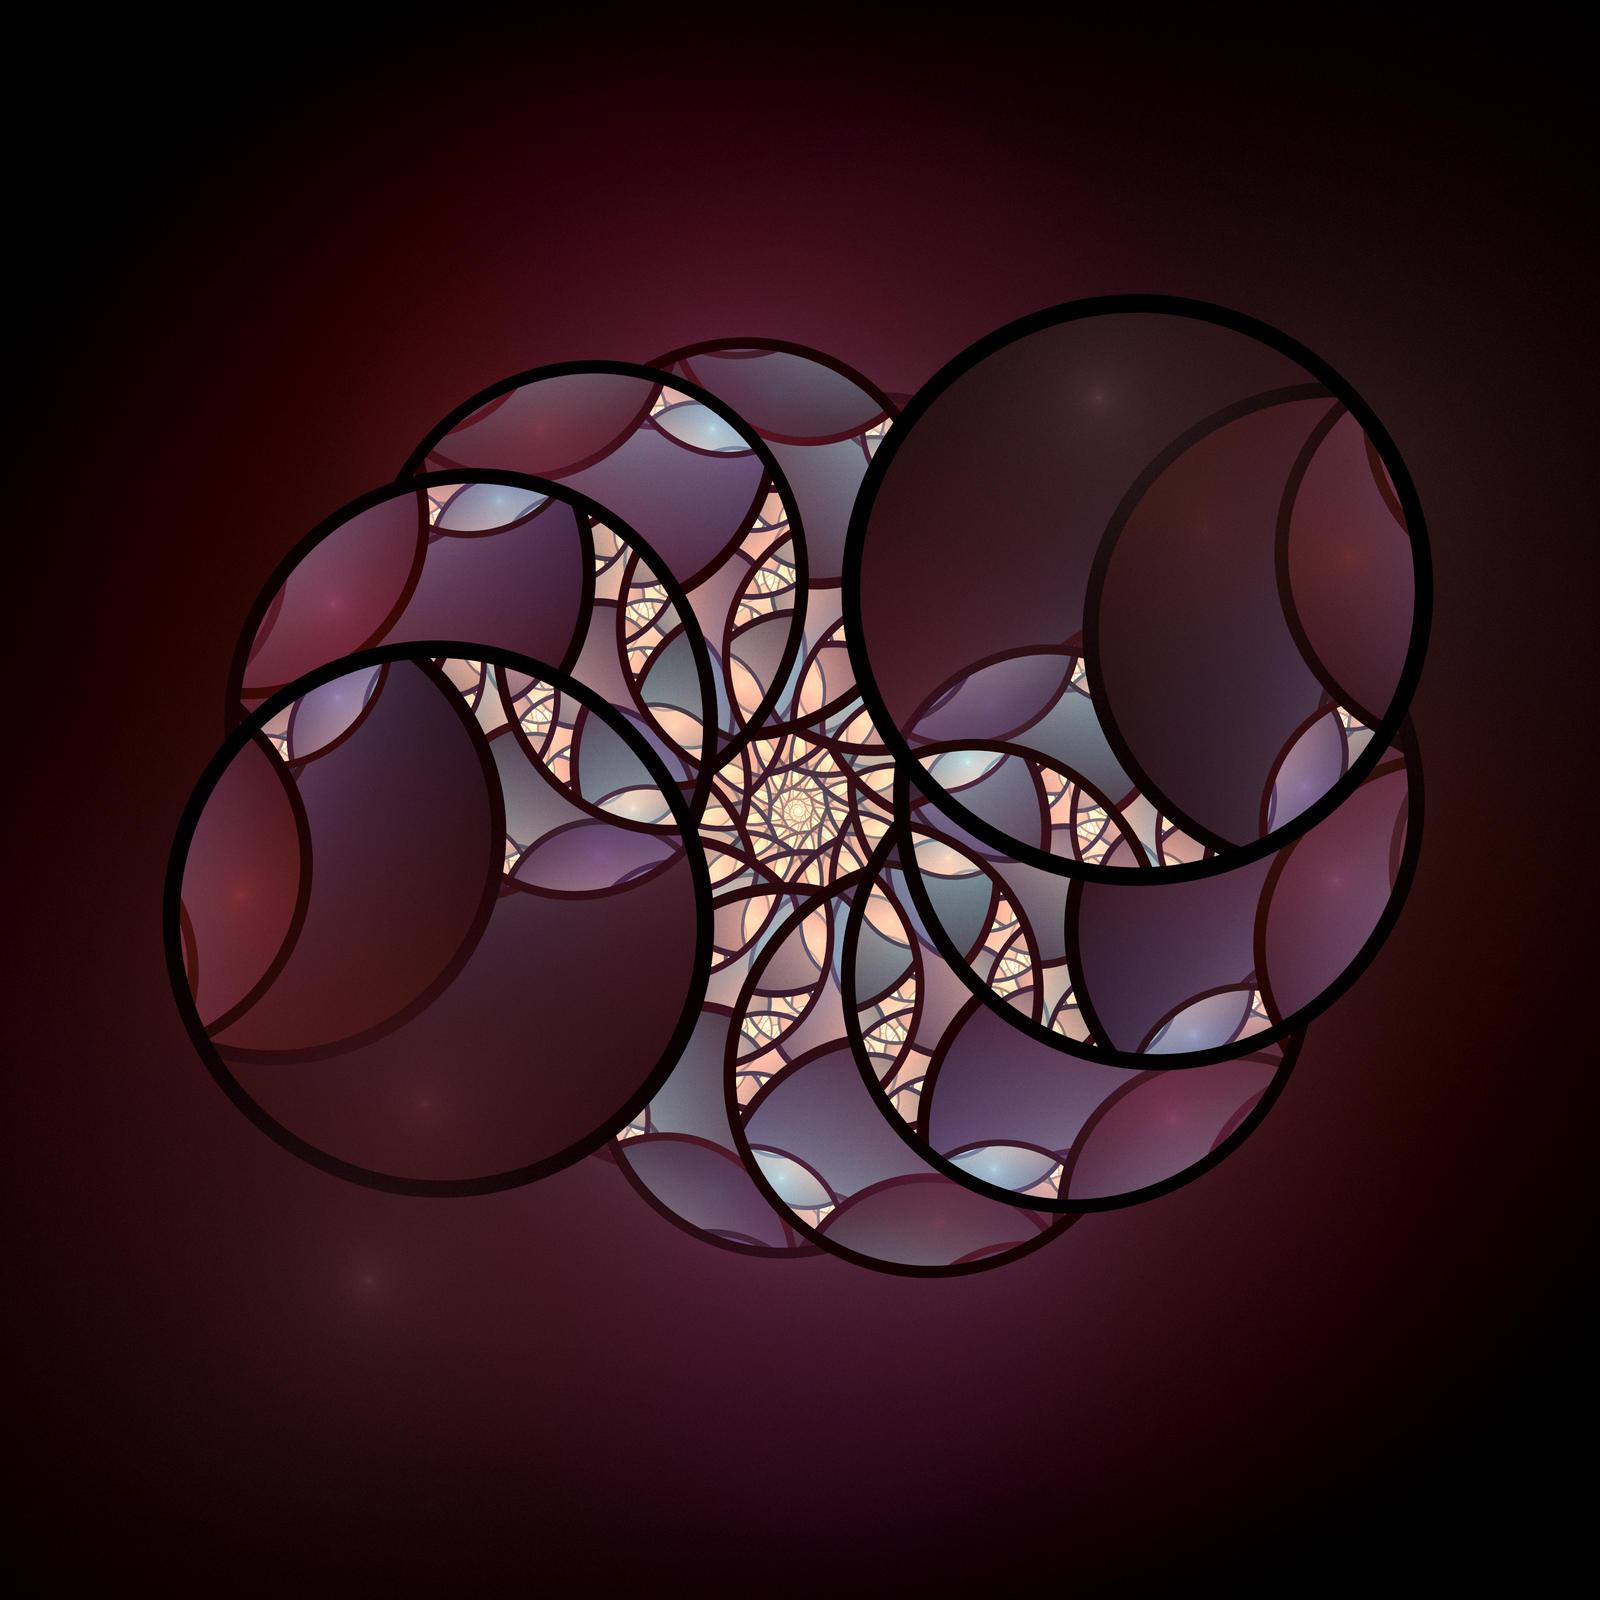 Maroon Circles by DeepChrome